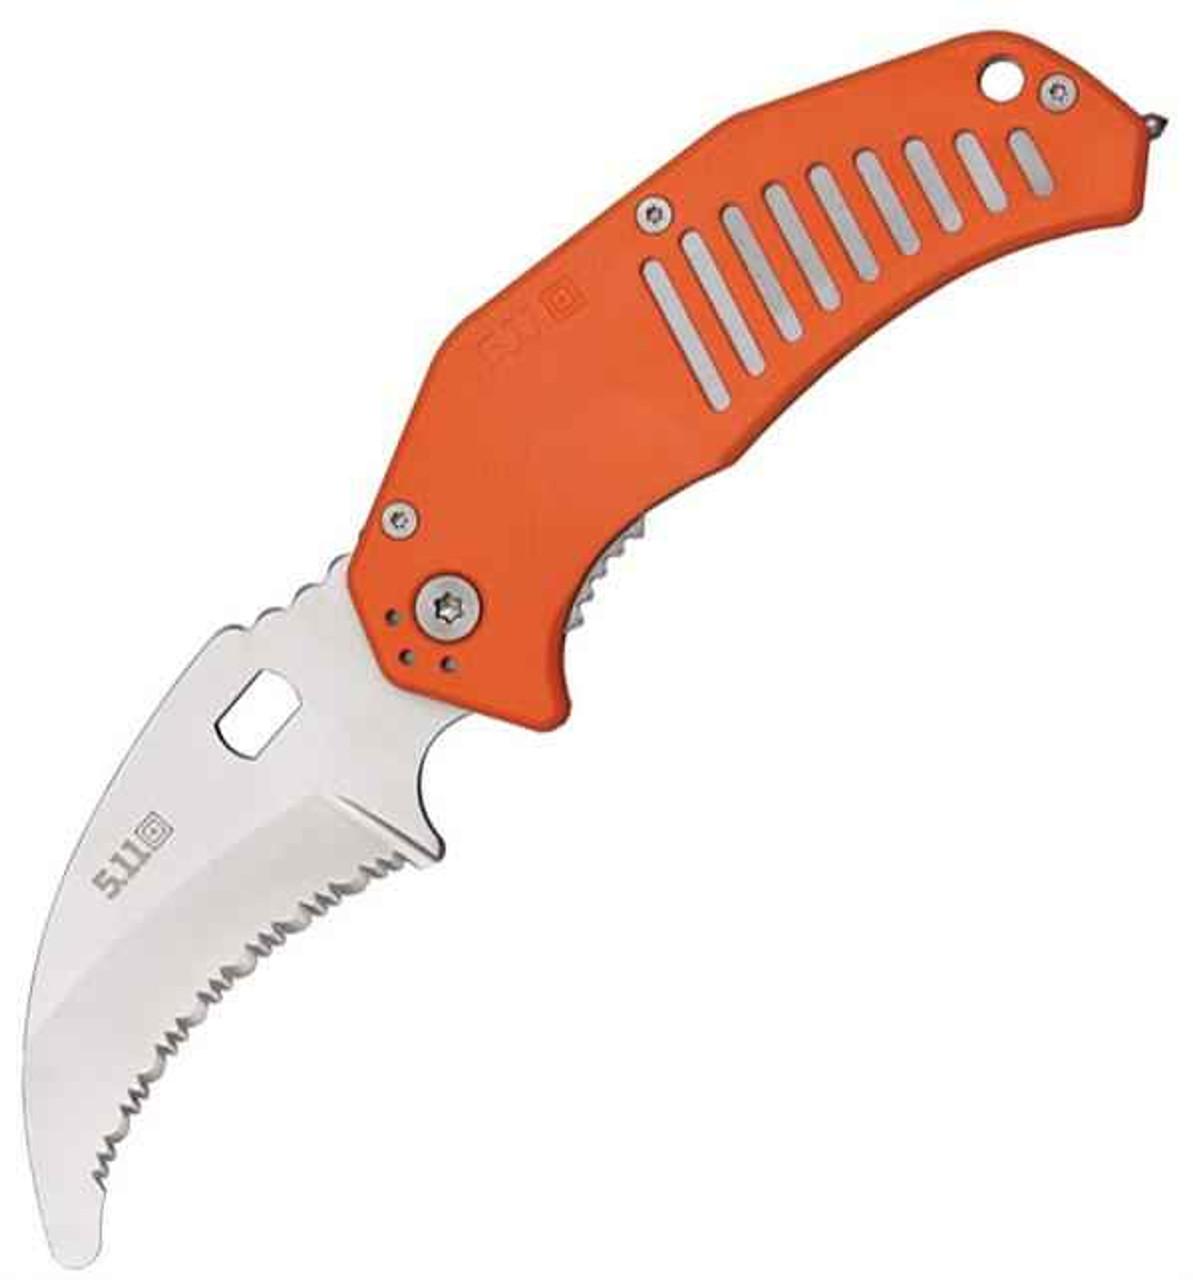 "5.11 Tactical 51086 LMC Curved, 3.25"" AUS-8 Serrated Blade, Orange FRN Handle"